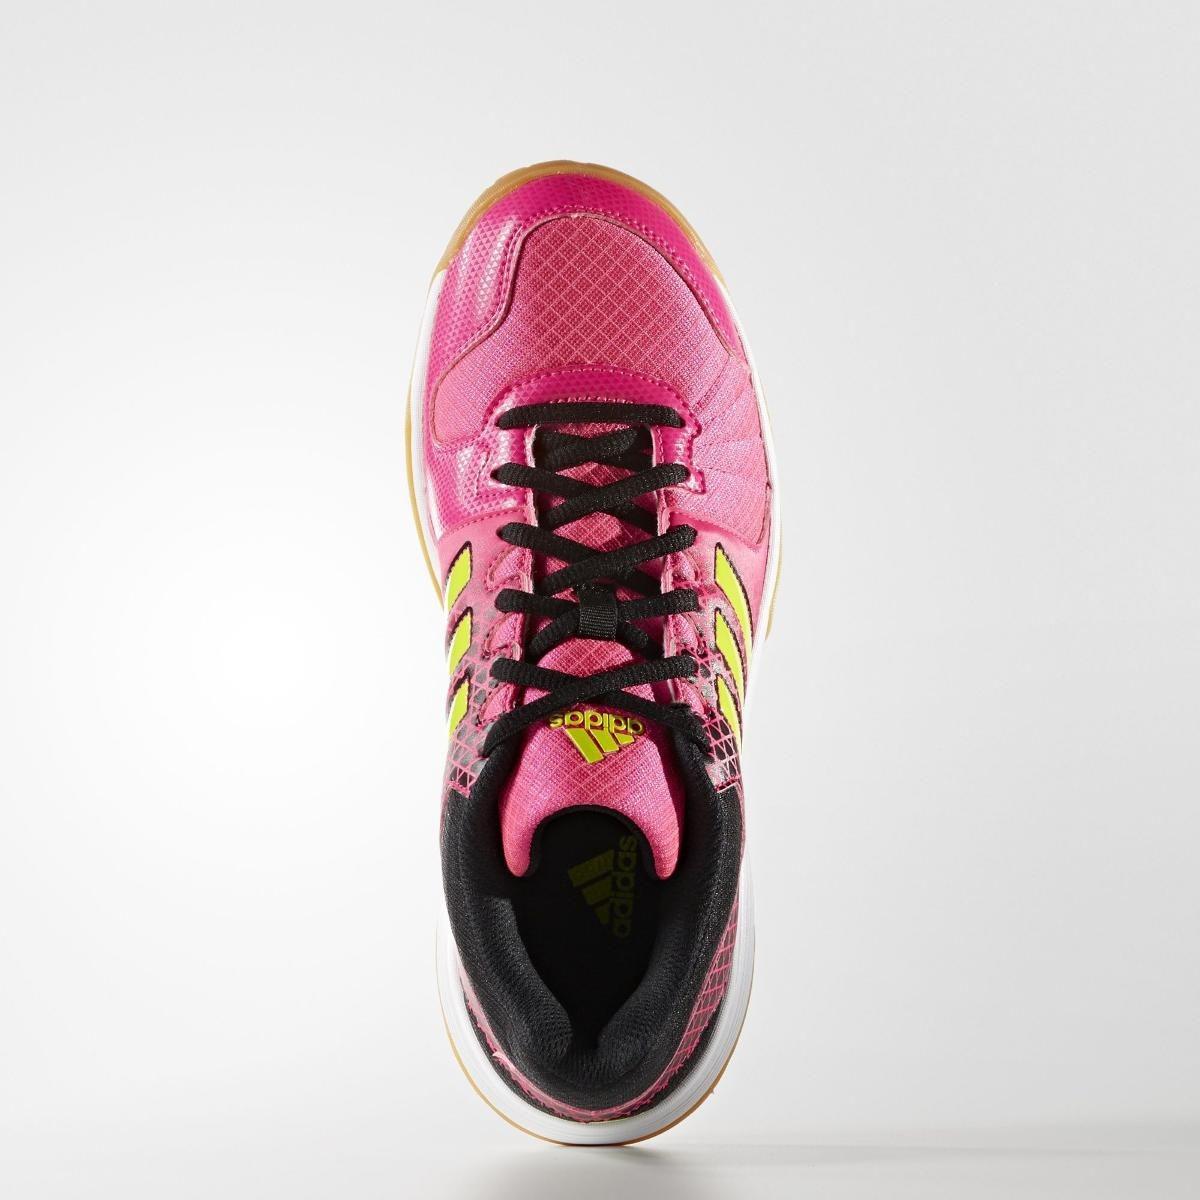 aa6351f0ba4d8 Carregando zoom... tênis vôlei adidas ligra 4 tecnologia adiwear® original